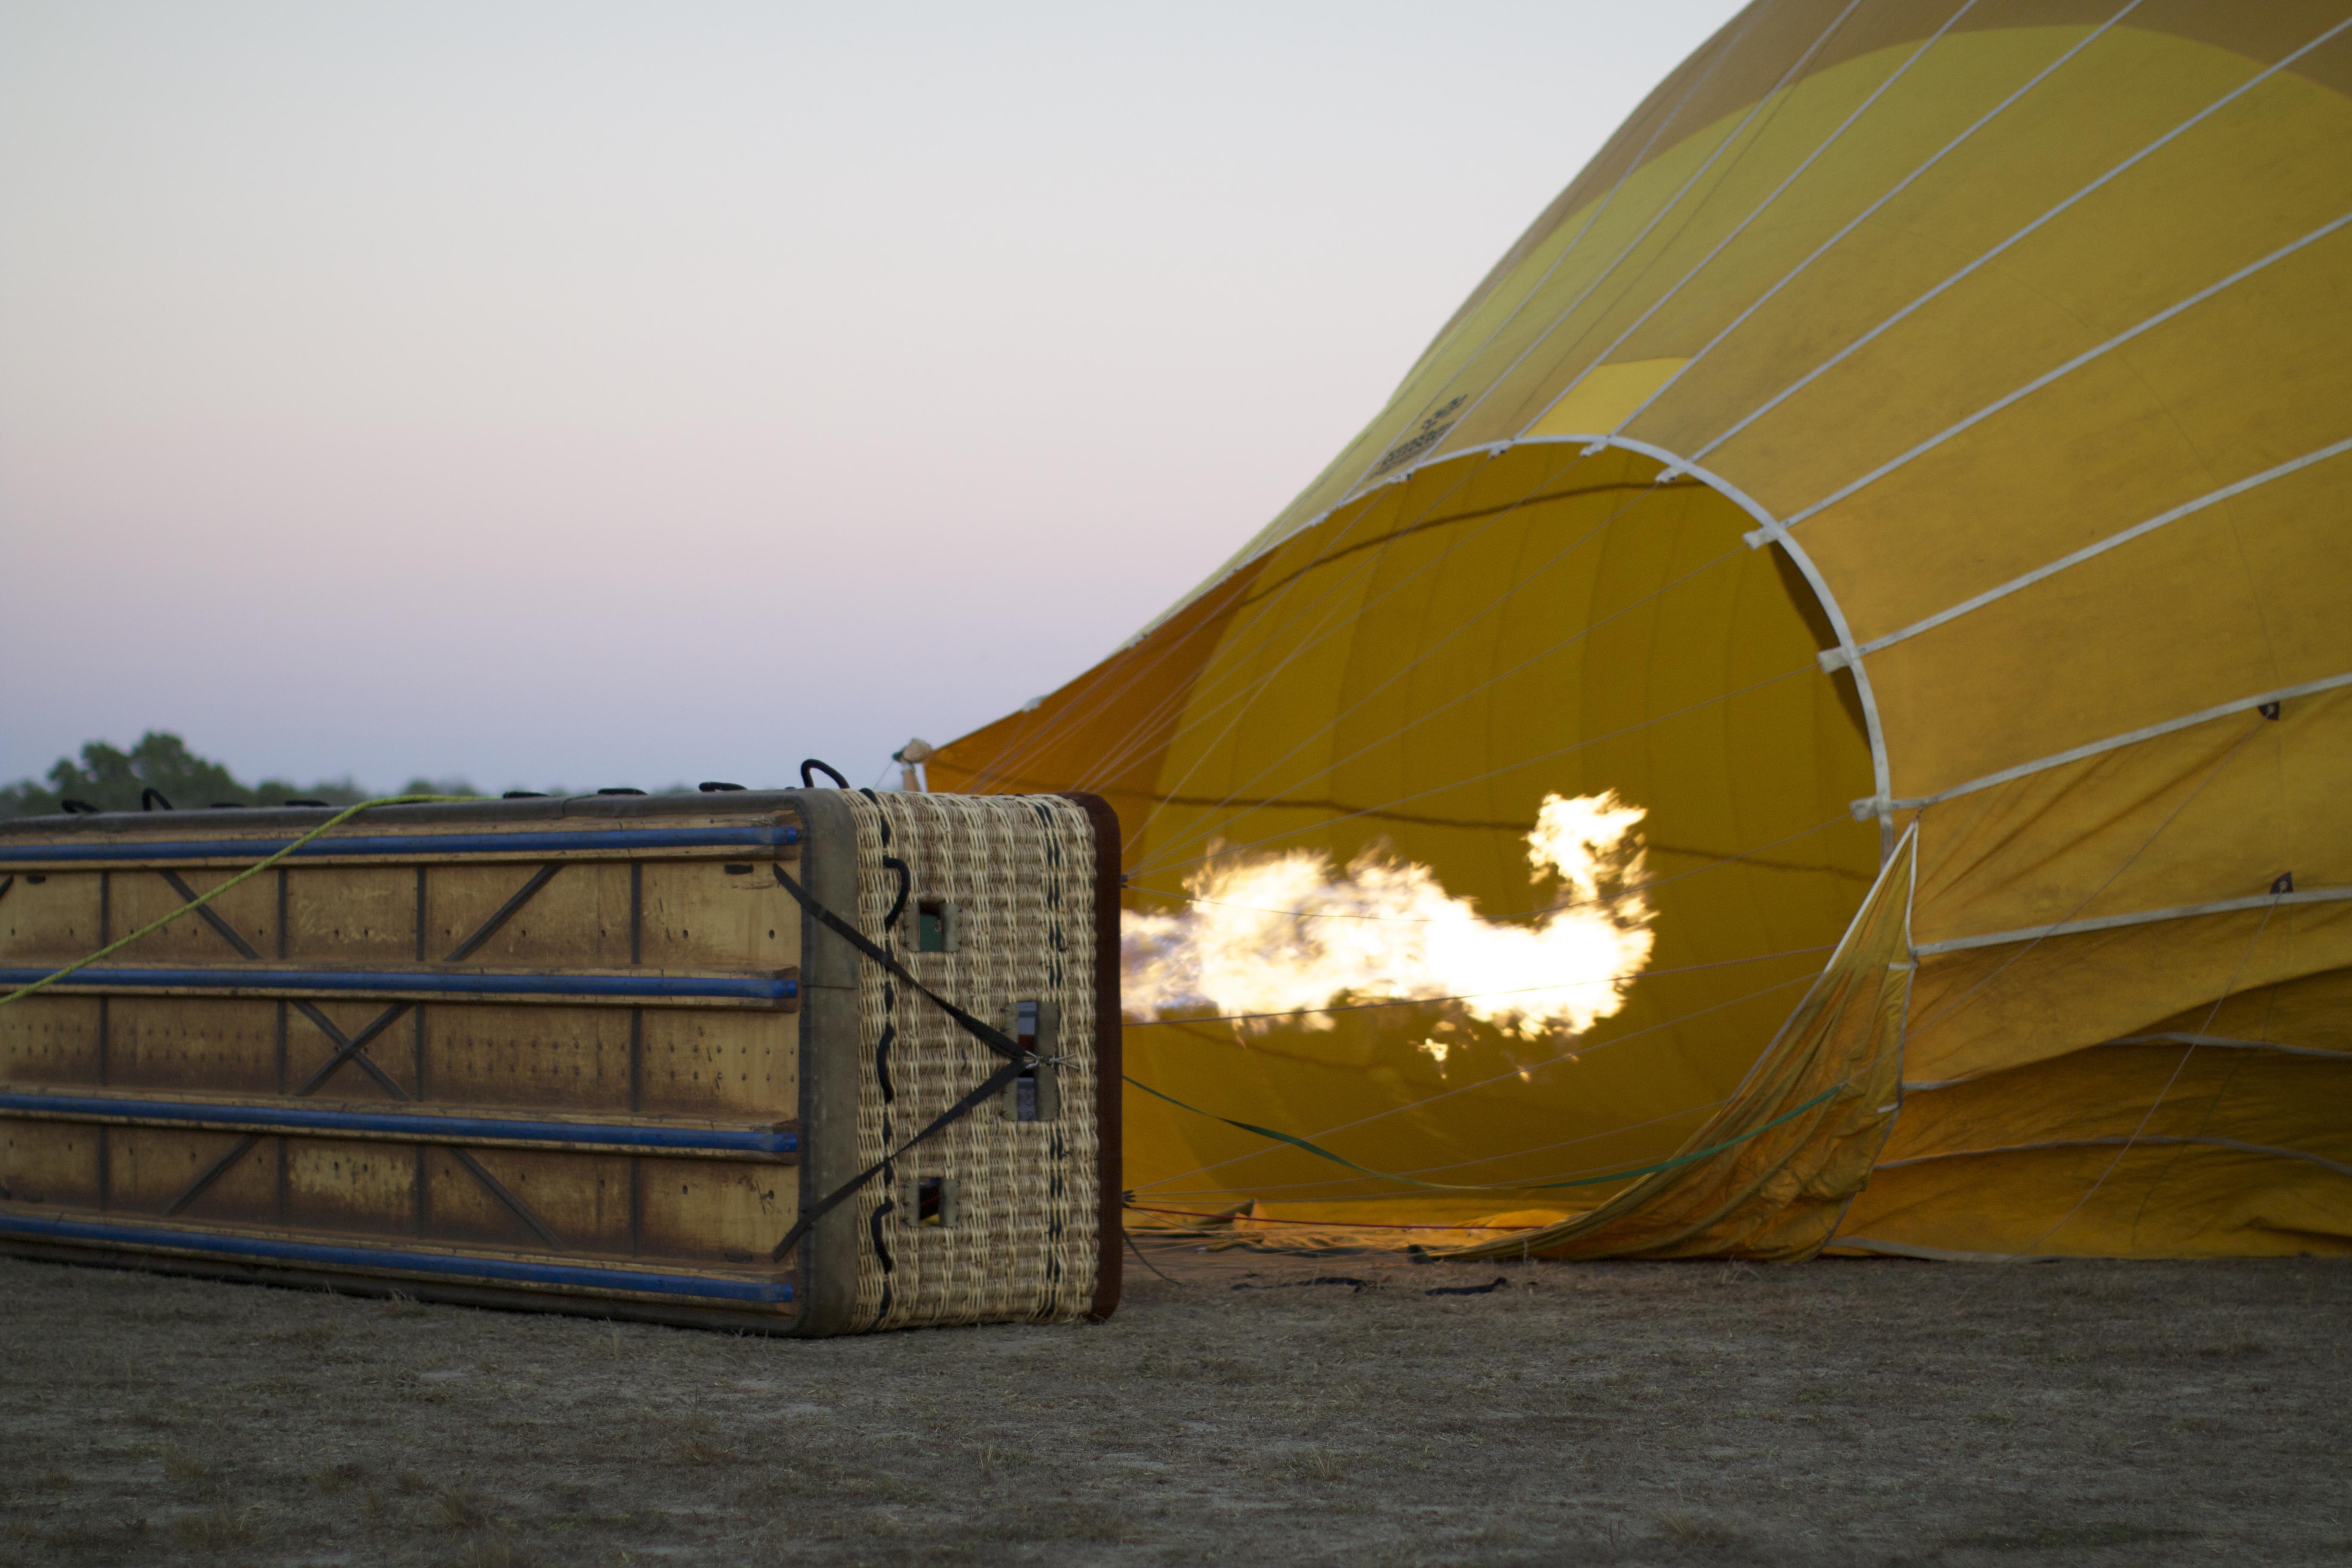 Sunrise flight over the Atherton